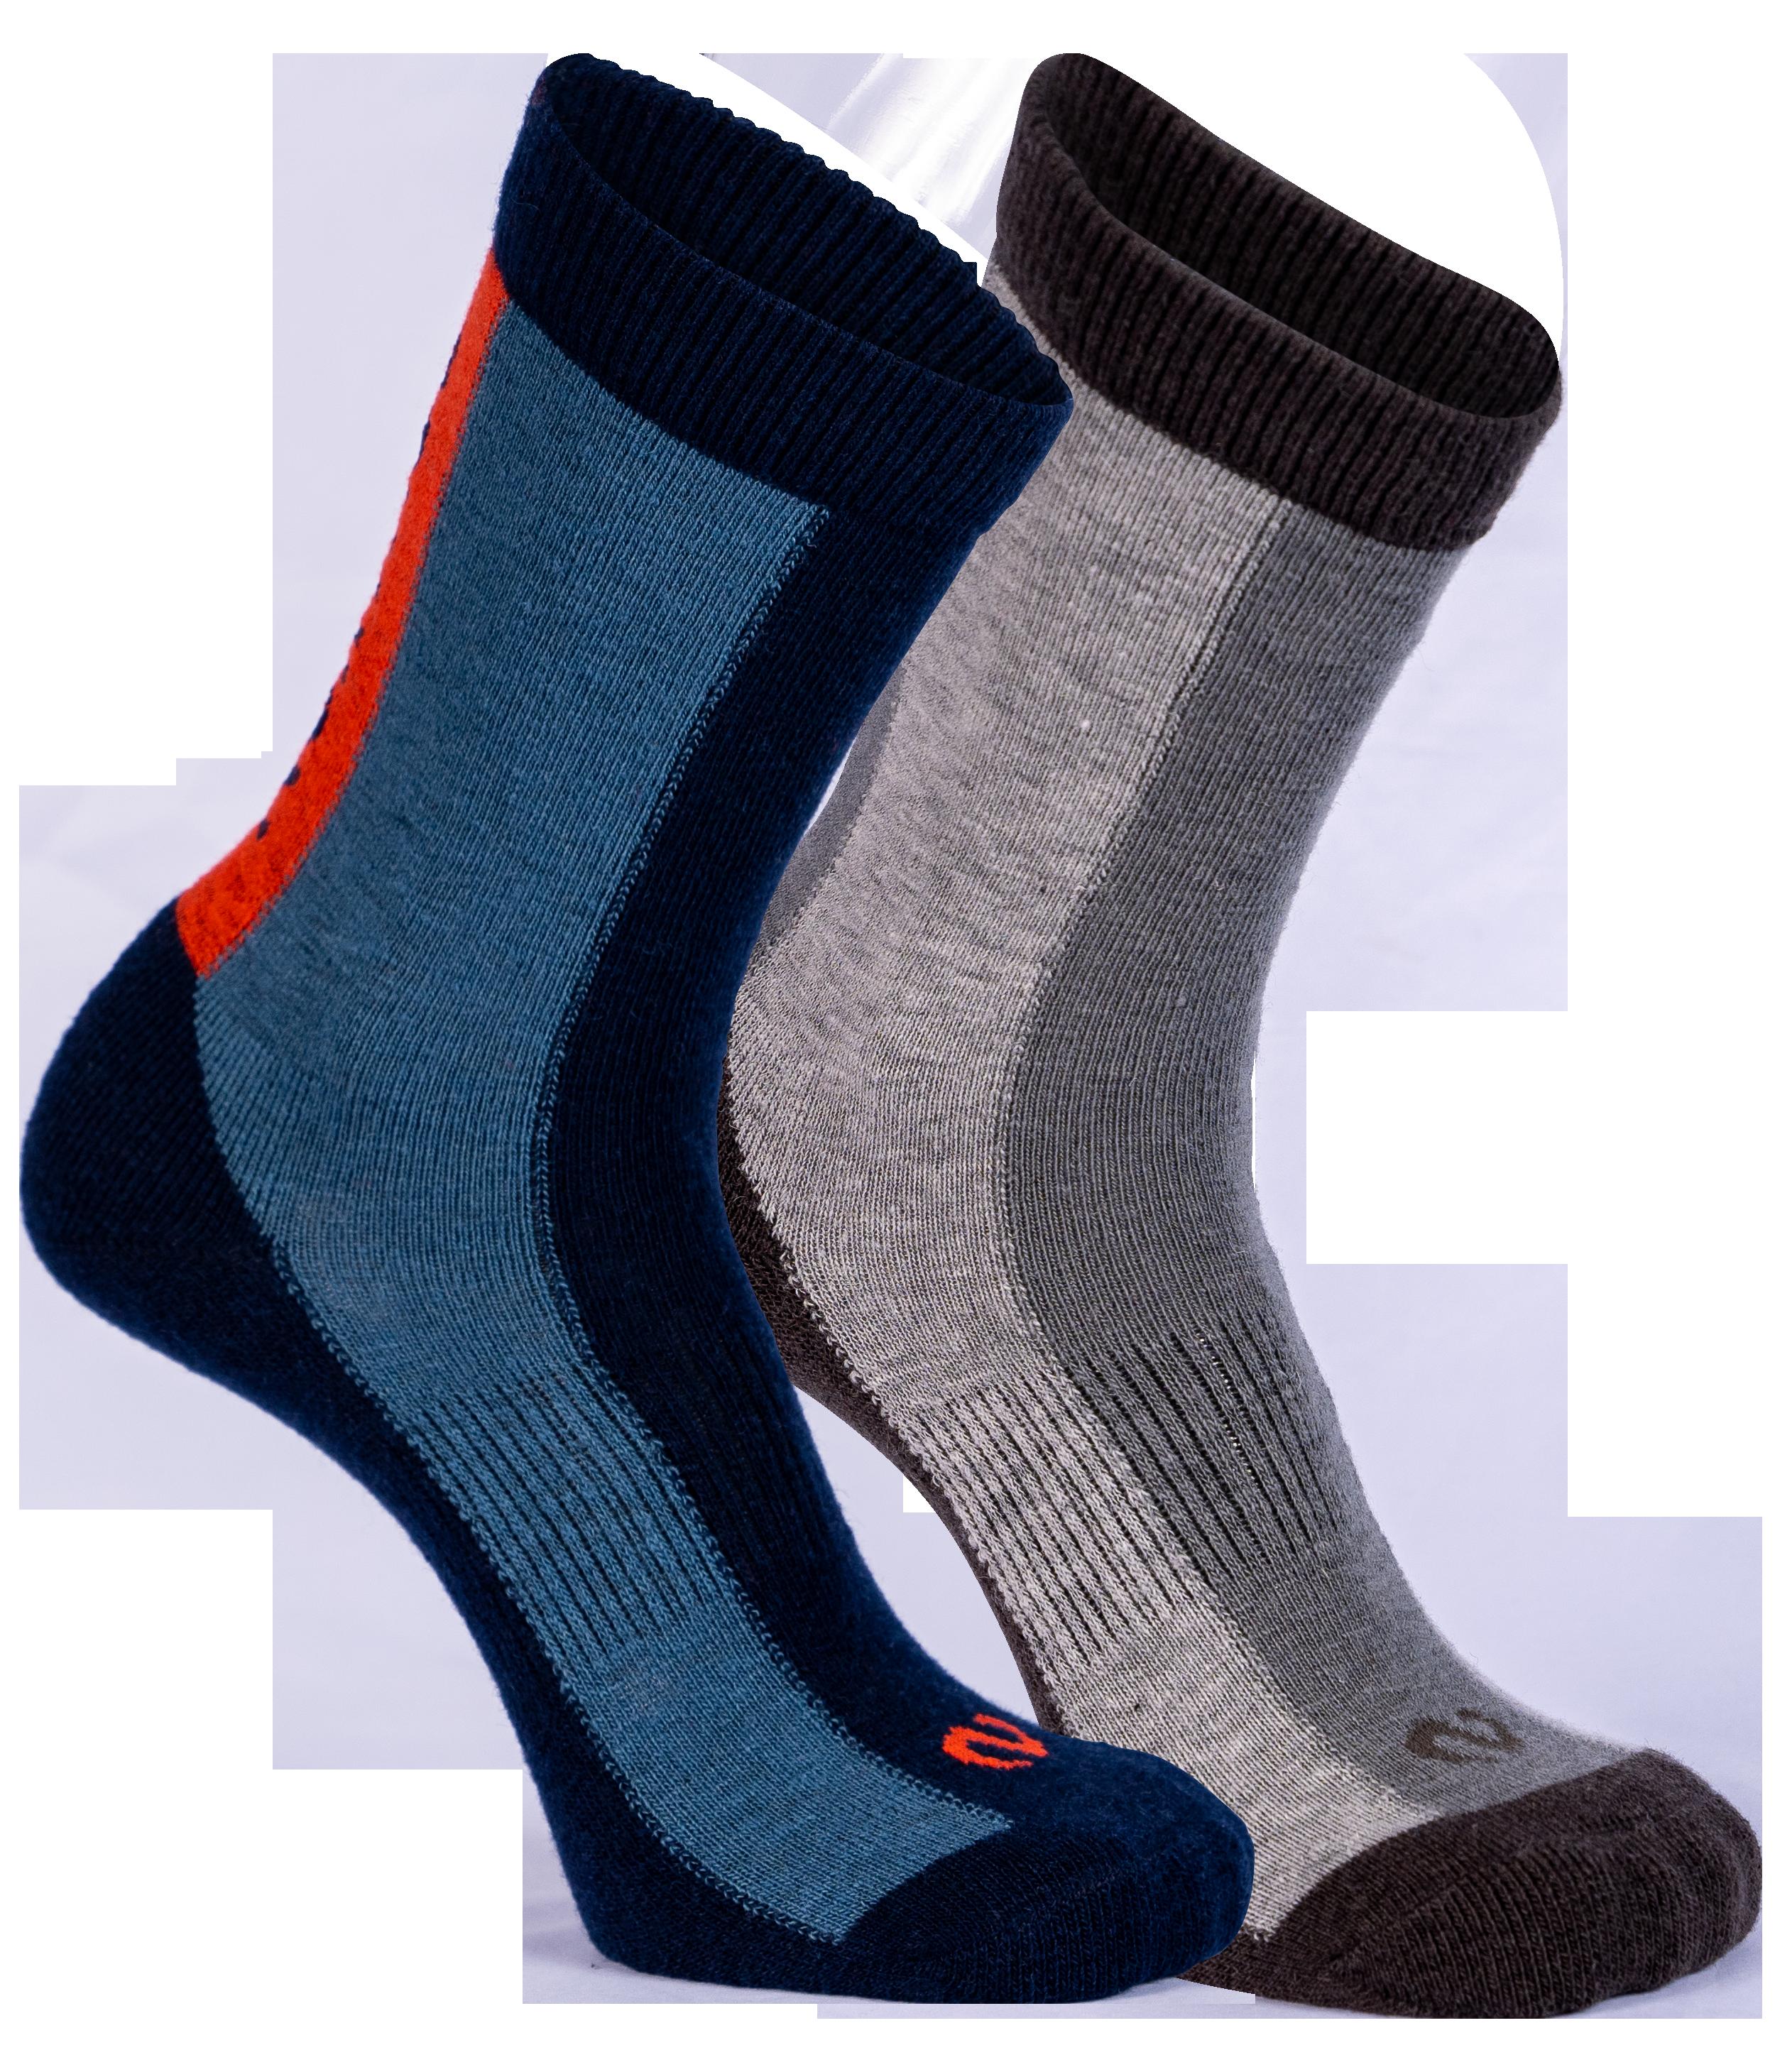 Northug Hovden 2PK Wool Socks, Unisex